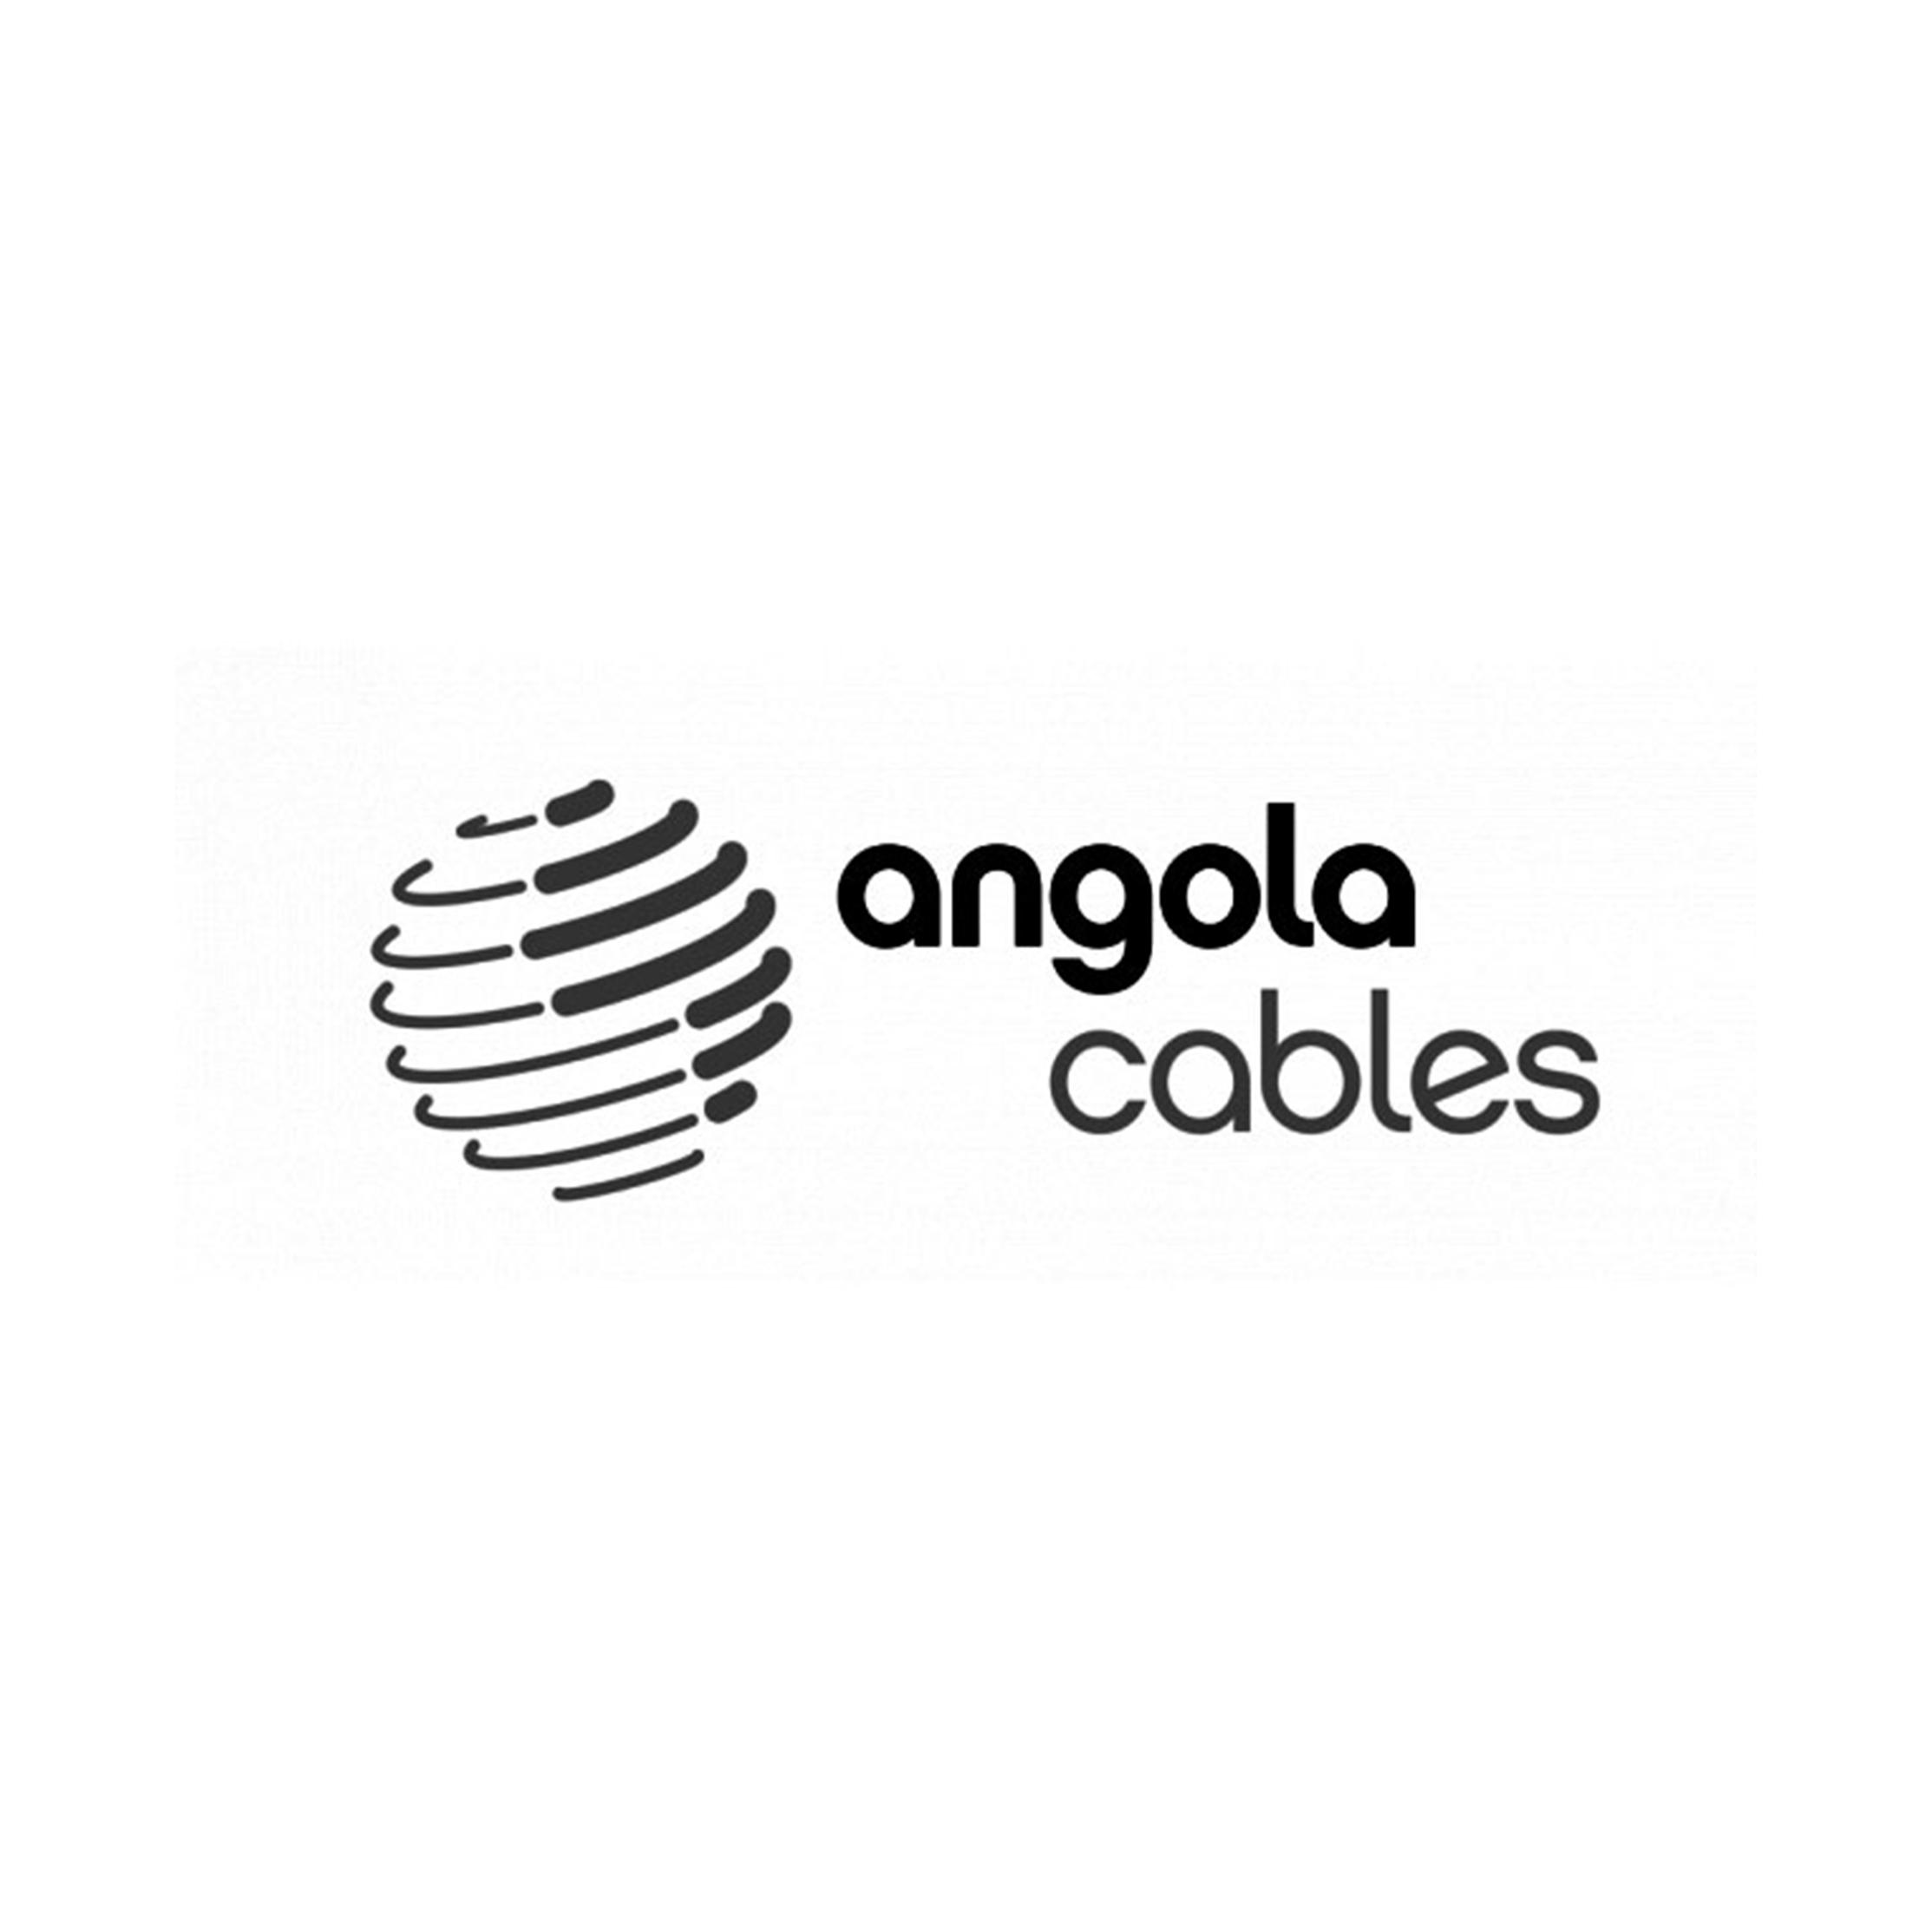 Angola_cables.jpg